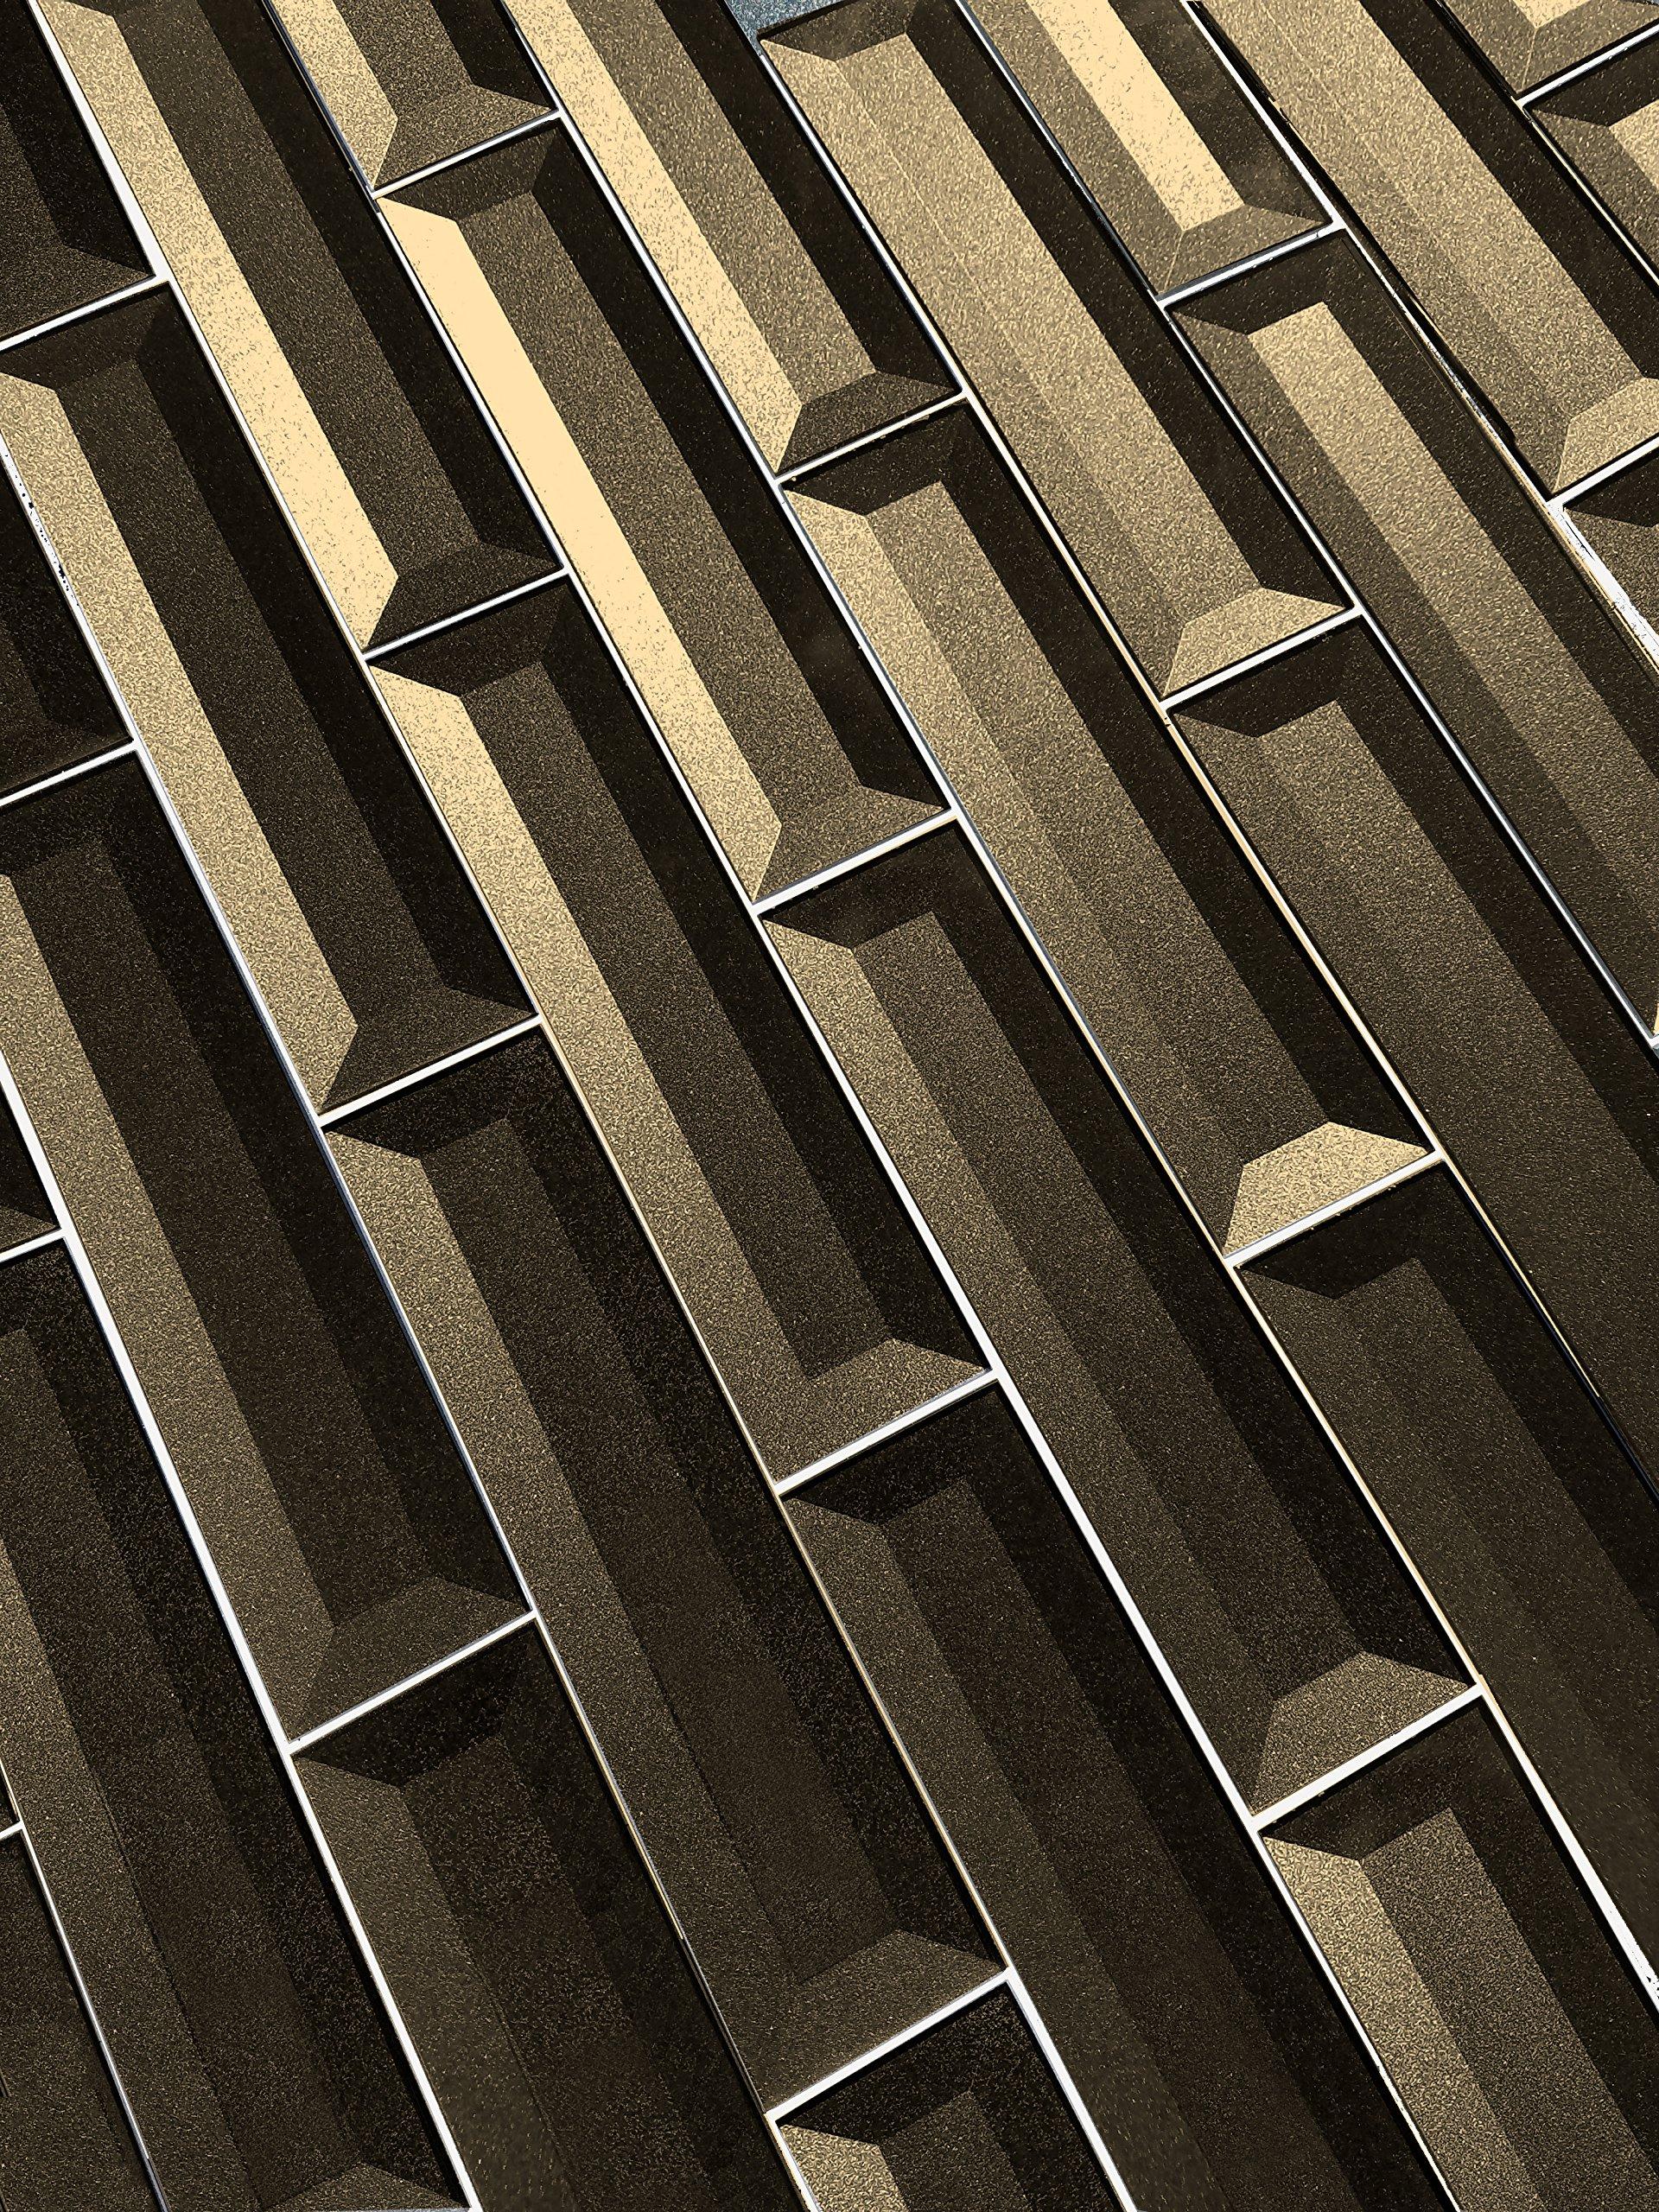 Abolos Inner Bevel 3D Glass Subway Tile Kitchen Bathroom Backsplash Home, 2'' W x 8'' L, 12.54 Sq. Ft, 114 Piece AMZJAB0208-BR 2'' W x 8'' L, 2'' W x 8'' L, Bronze by Abolos